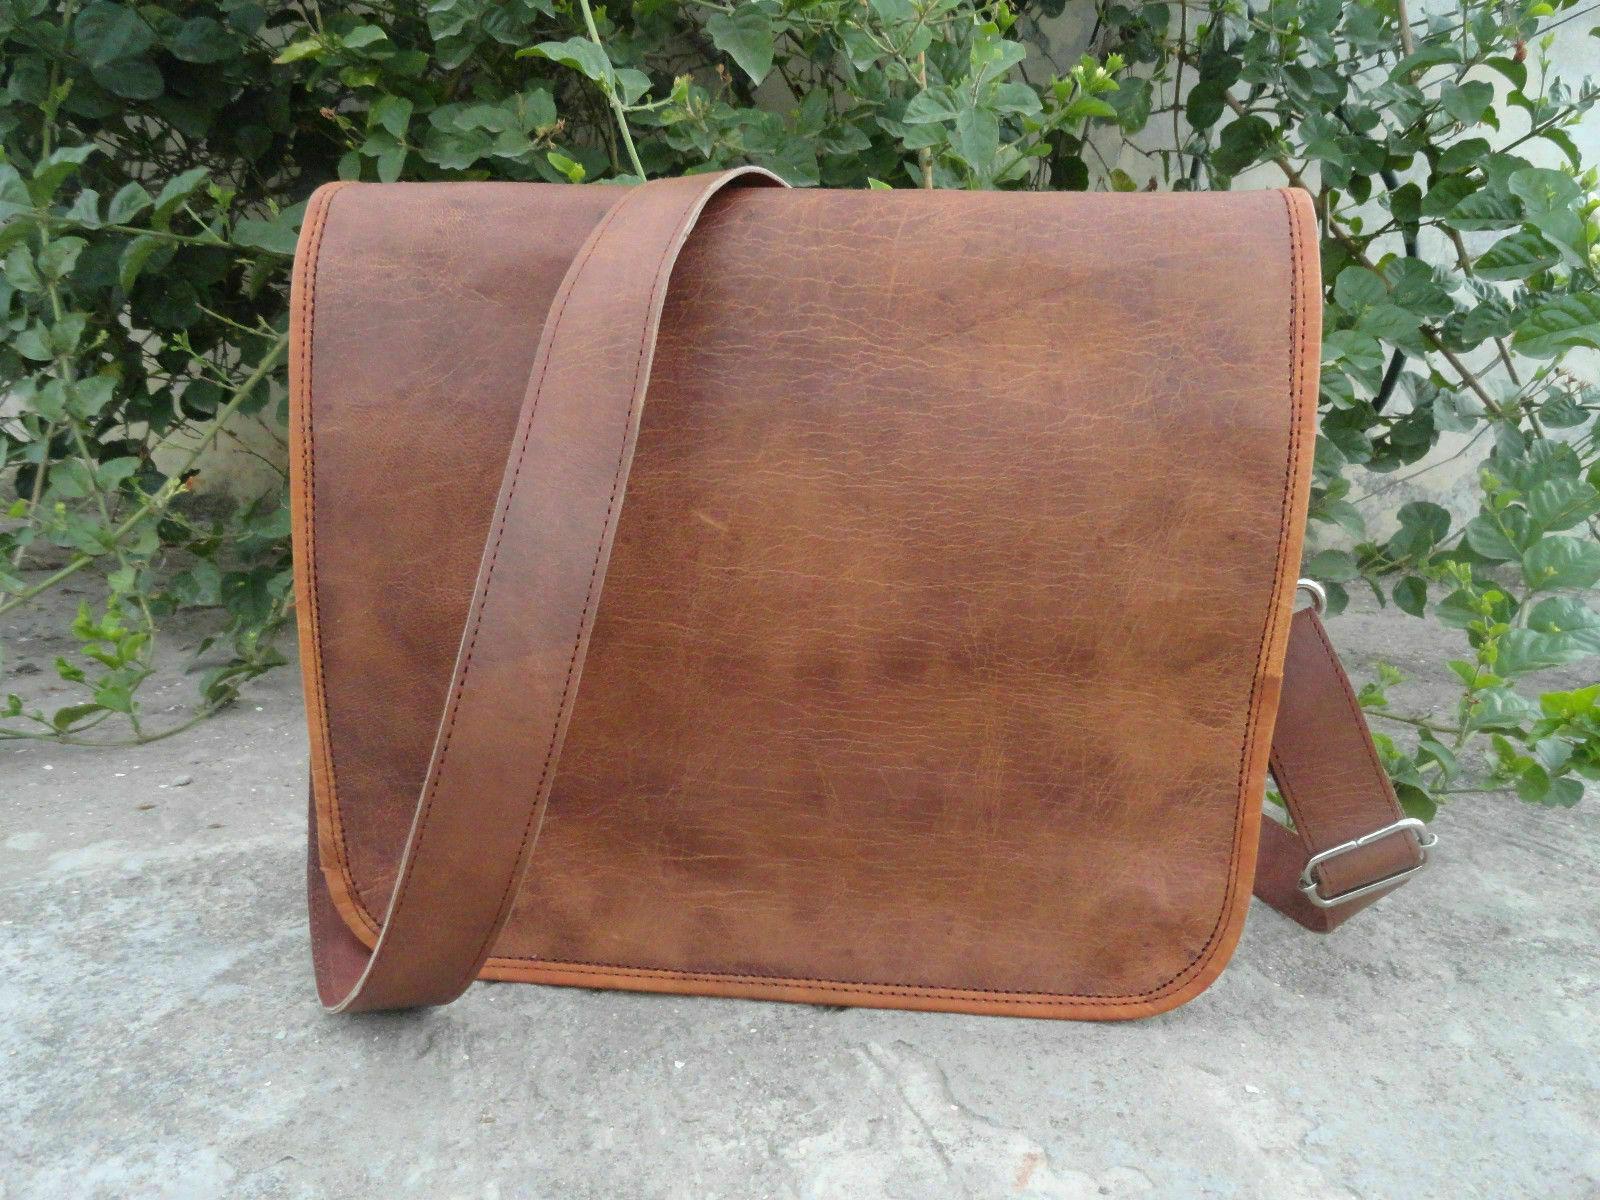 Best Trade Vintage Vintage Vintage Leder Messenger Echtes Satchel Bag Genuine Laptop Aktentasche      Authentische Garantie  b894c7